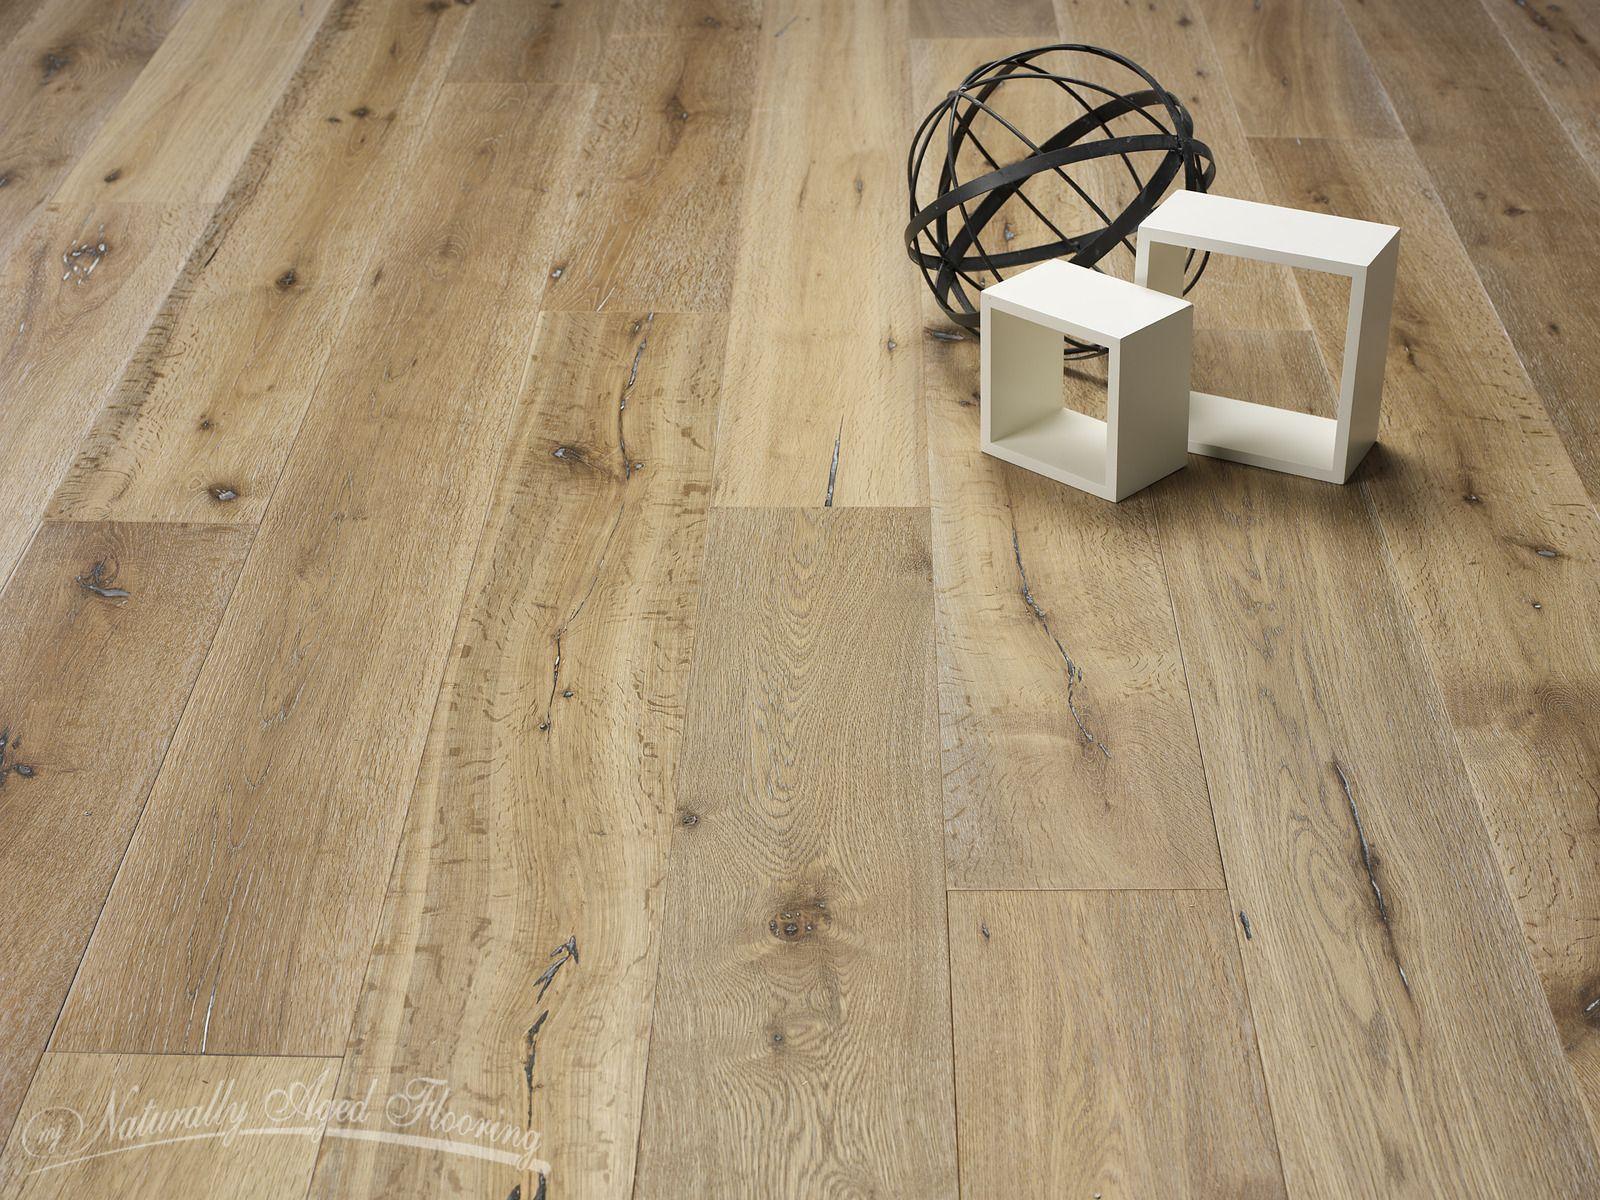 Install Vinyl Flooring Over Plywood Subfloor in 2020